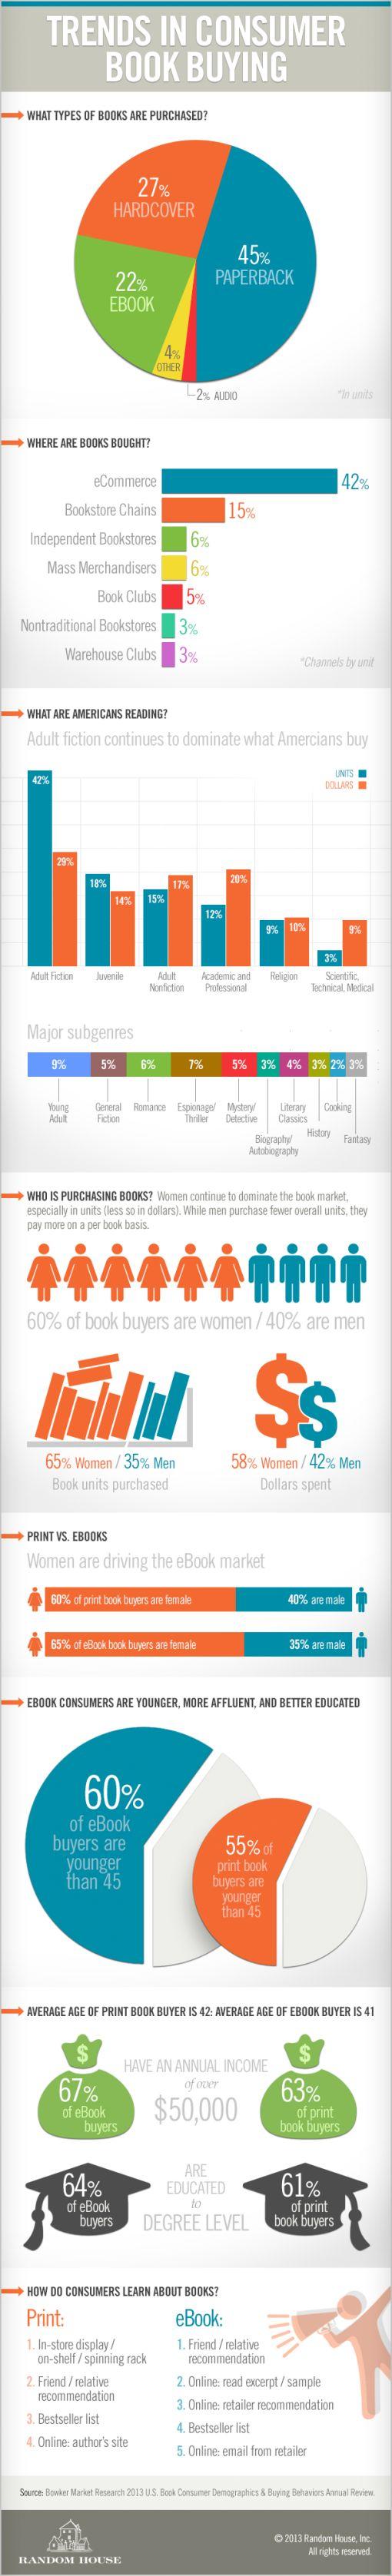 2013 Book Buying Trends…061413